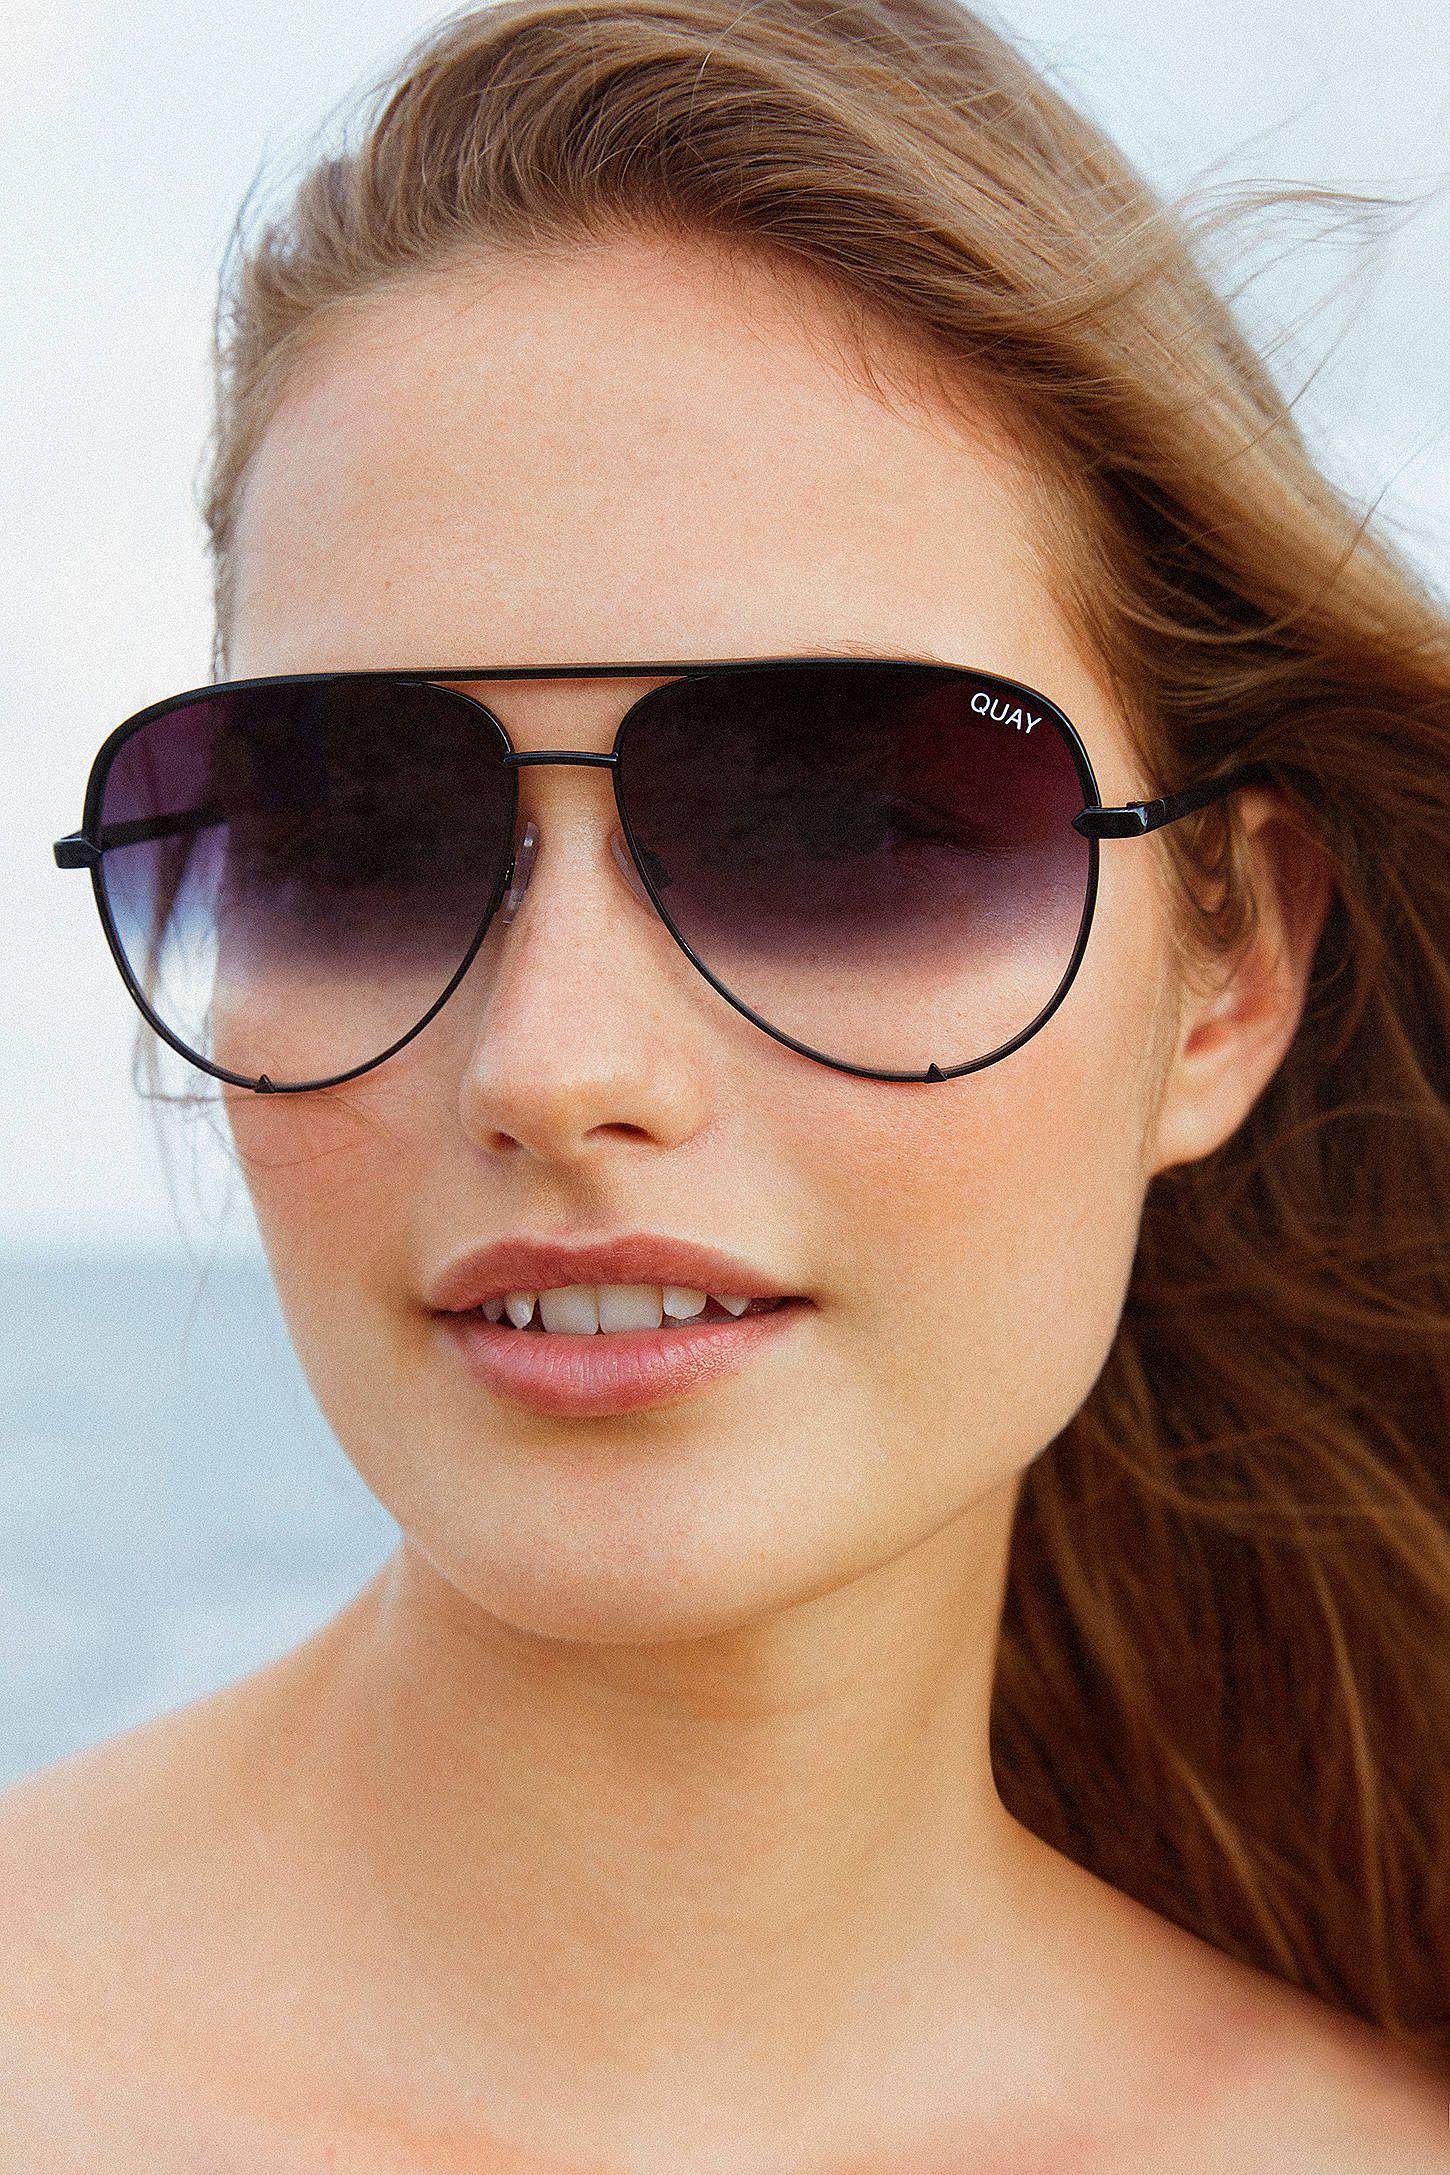 abcd2fb3c8d Slide View  1  Quay X Desi Perkins High Key Aviator Sunglasses